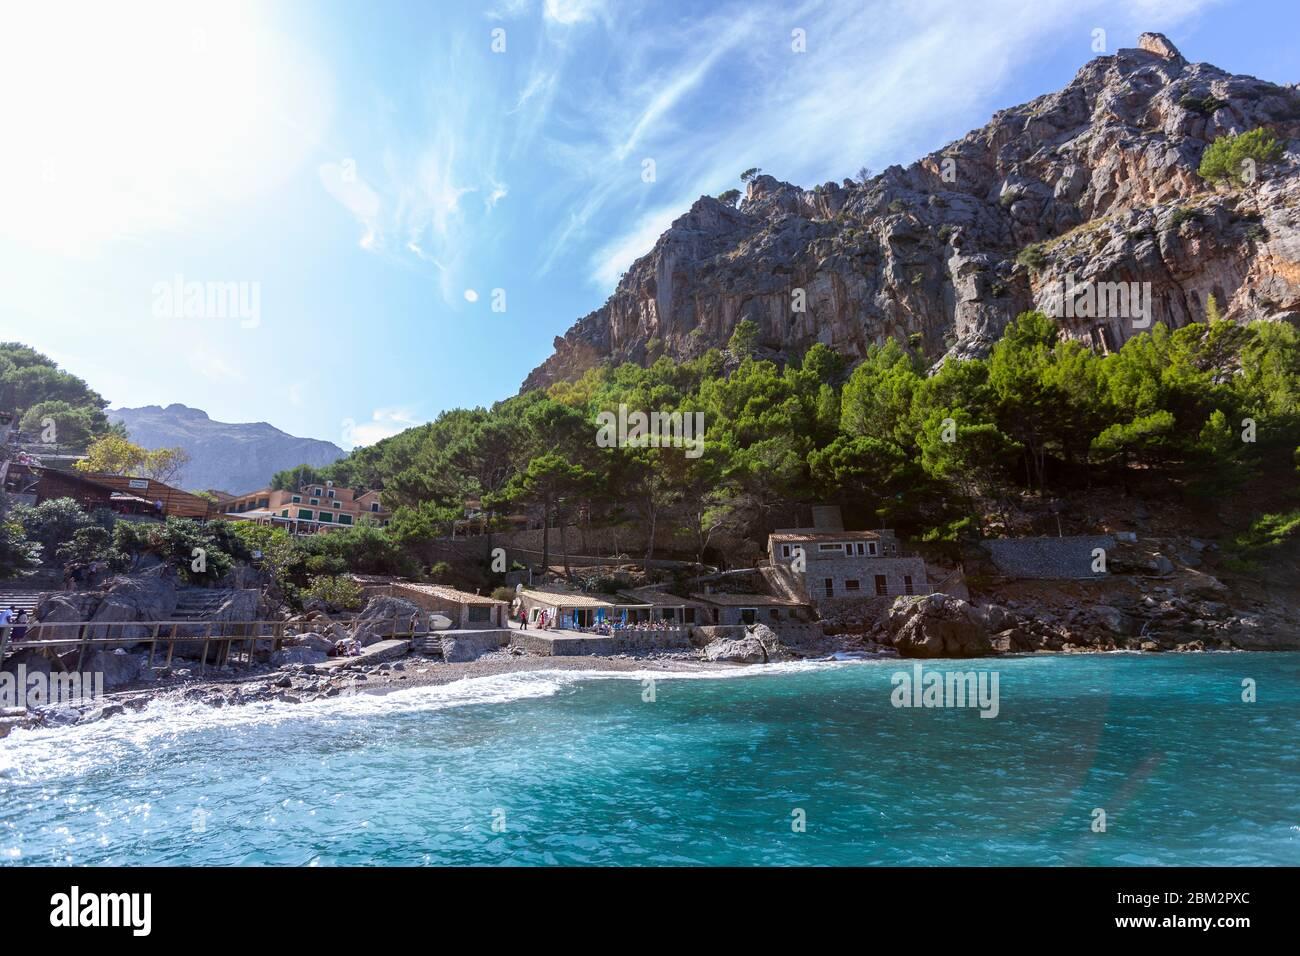 Torrent de Pareis , Sa Calobra, Balearic Islands, Spain Stock Photo